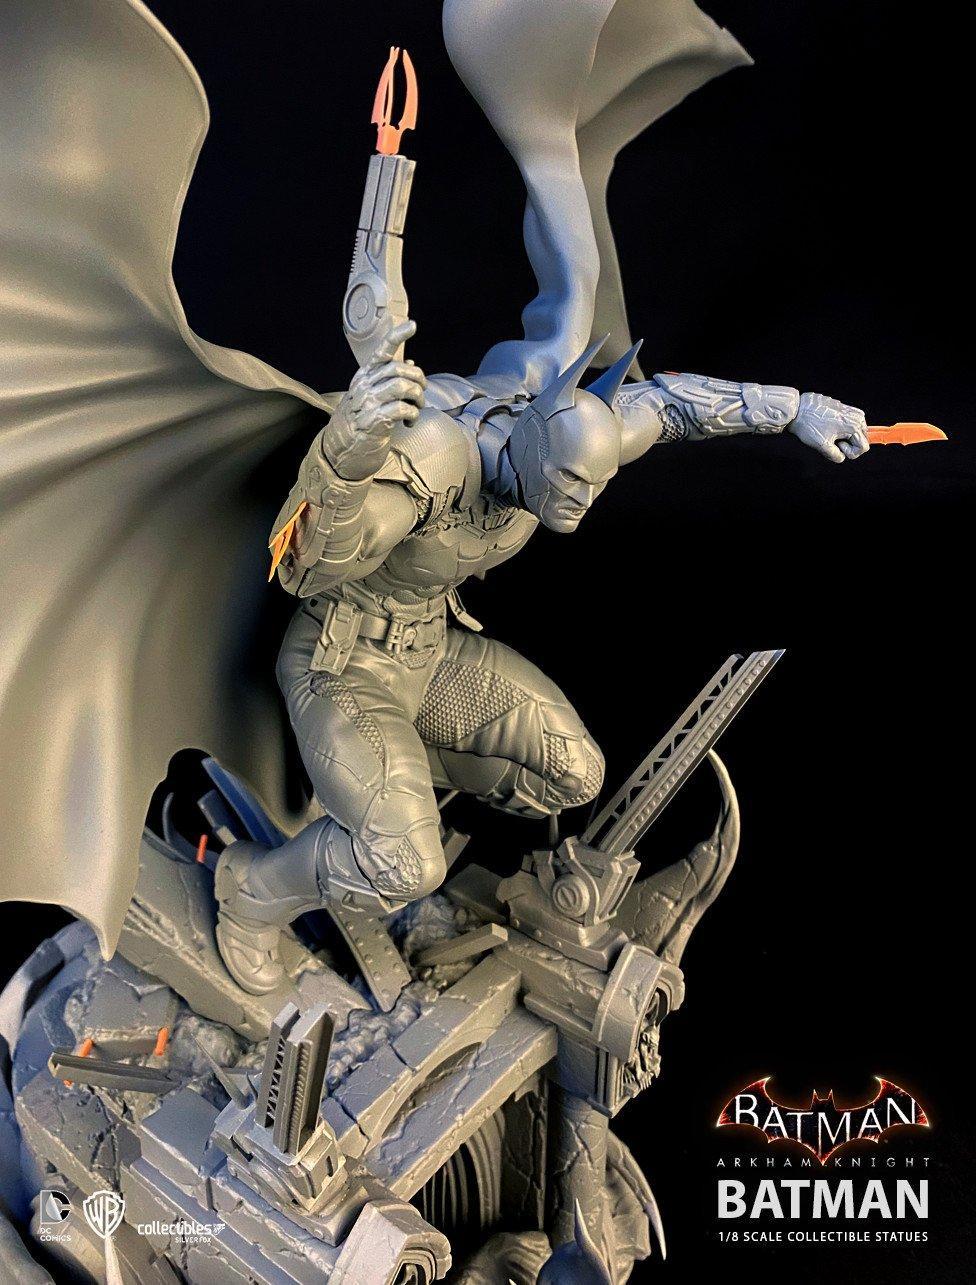 Batman siver fox collectibles batman arkham knight 1 8 scale statue12